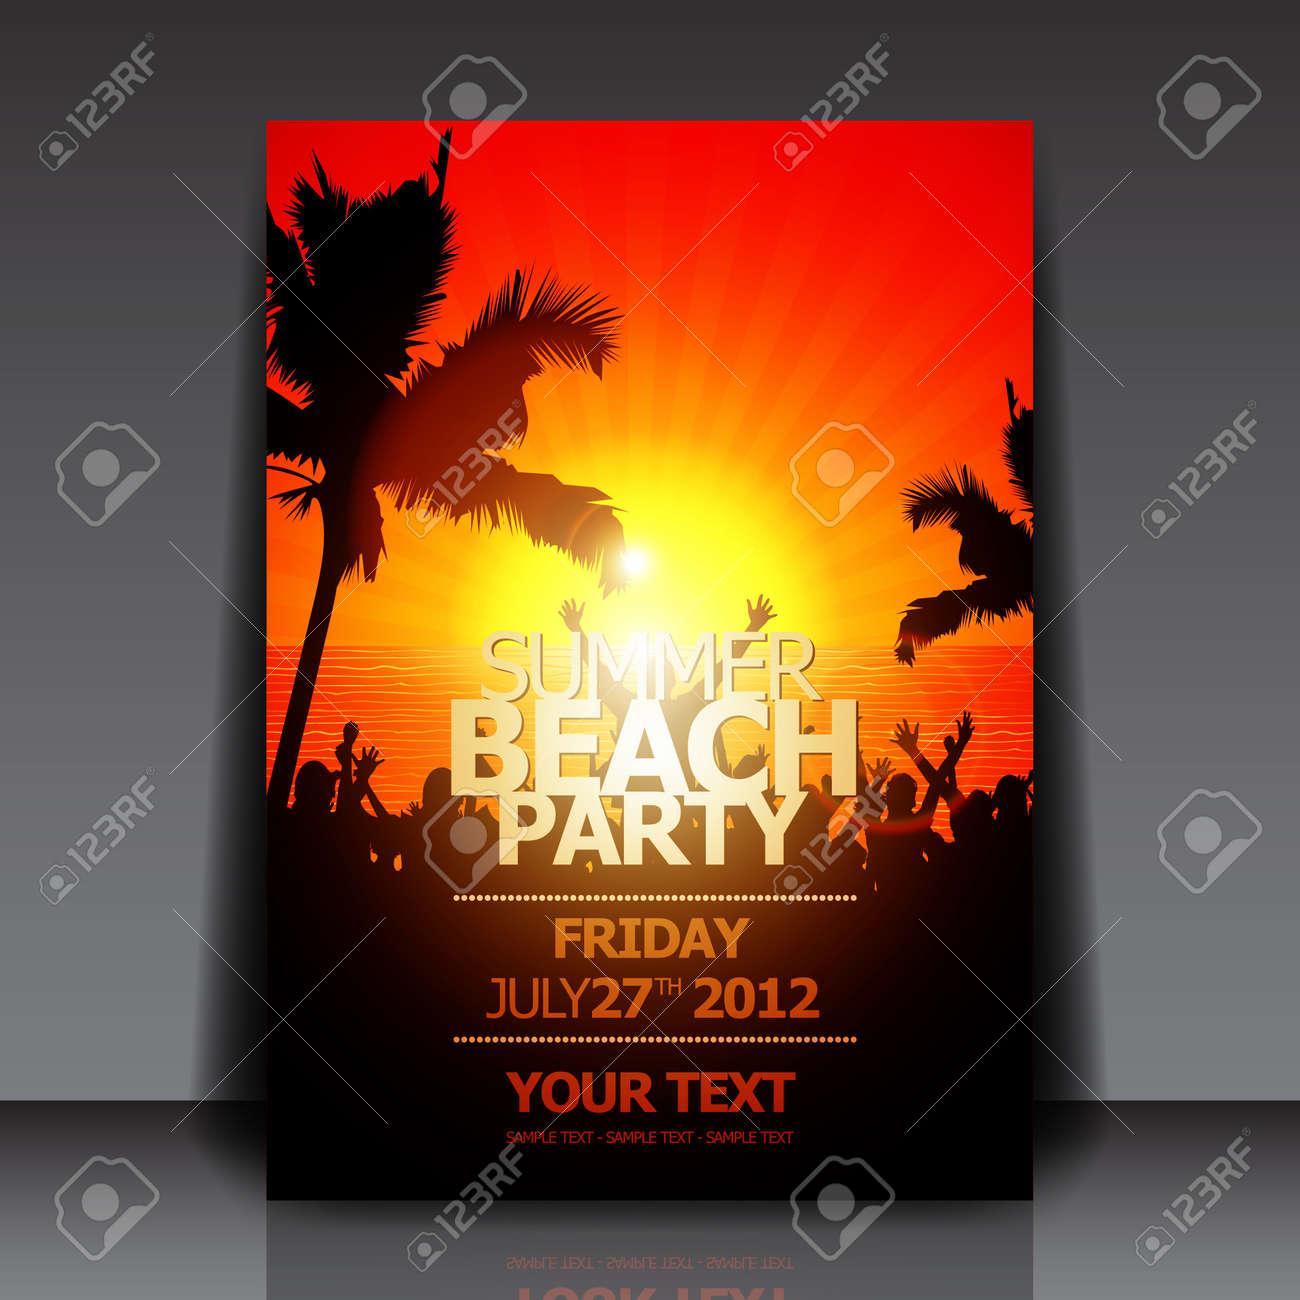 Summer Beach Party Flyer Stock Vector - 14425234